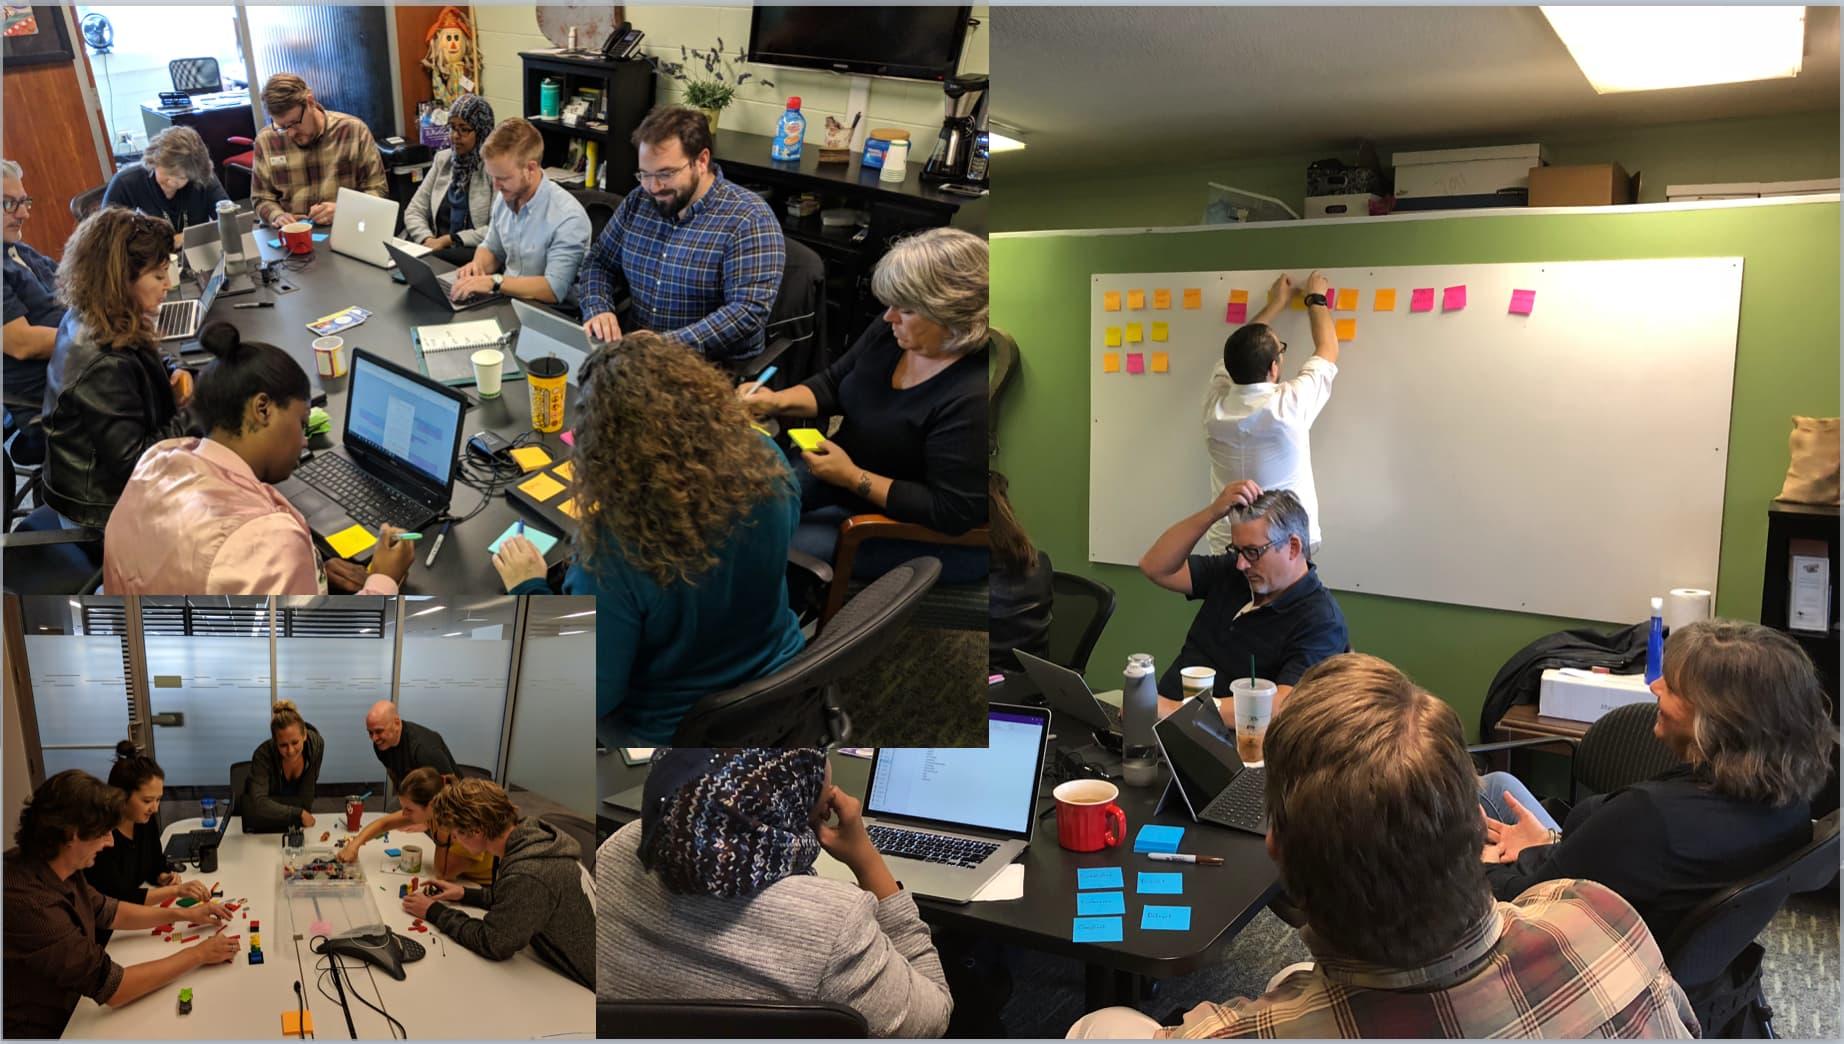 The DePalma team at UX workshops